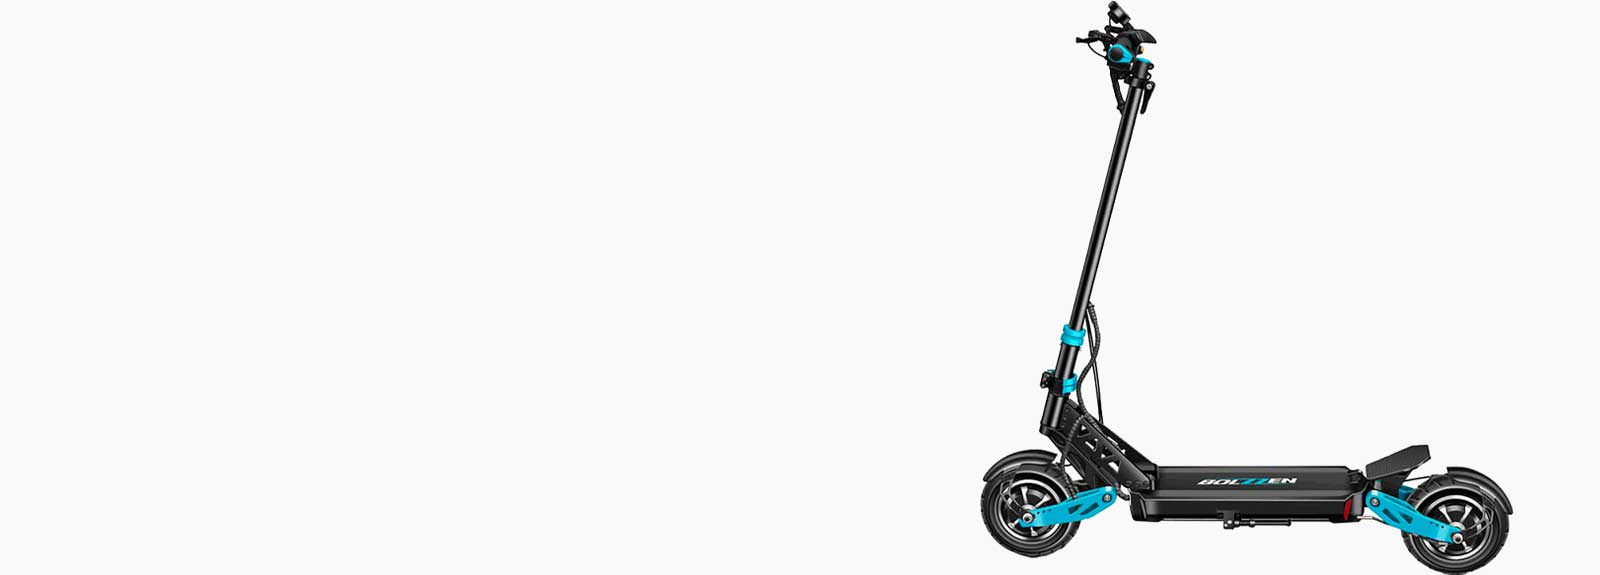 Macarthur eBikes Category eScooter